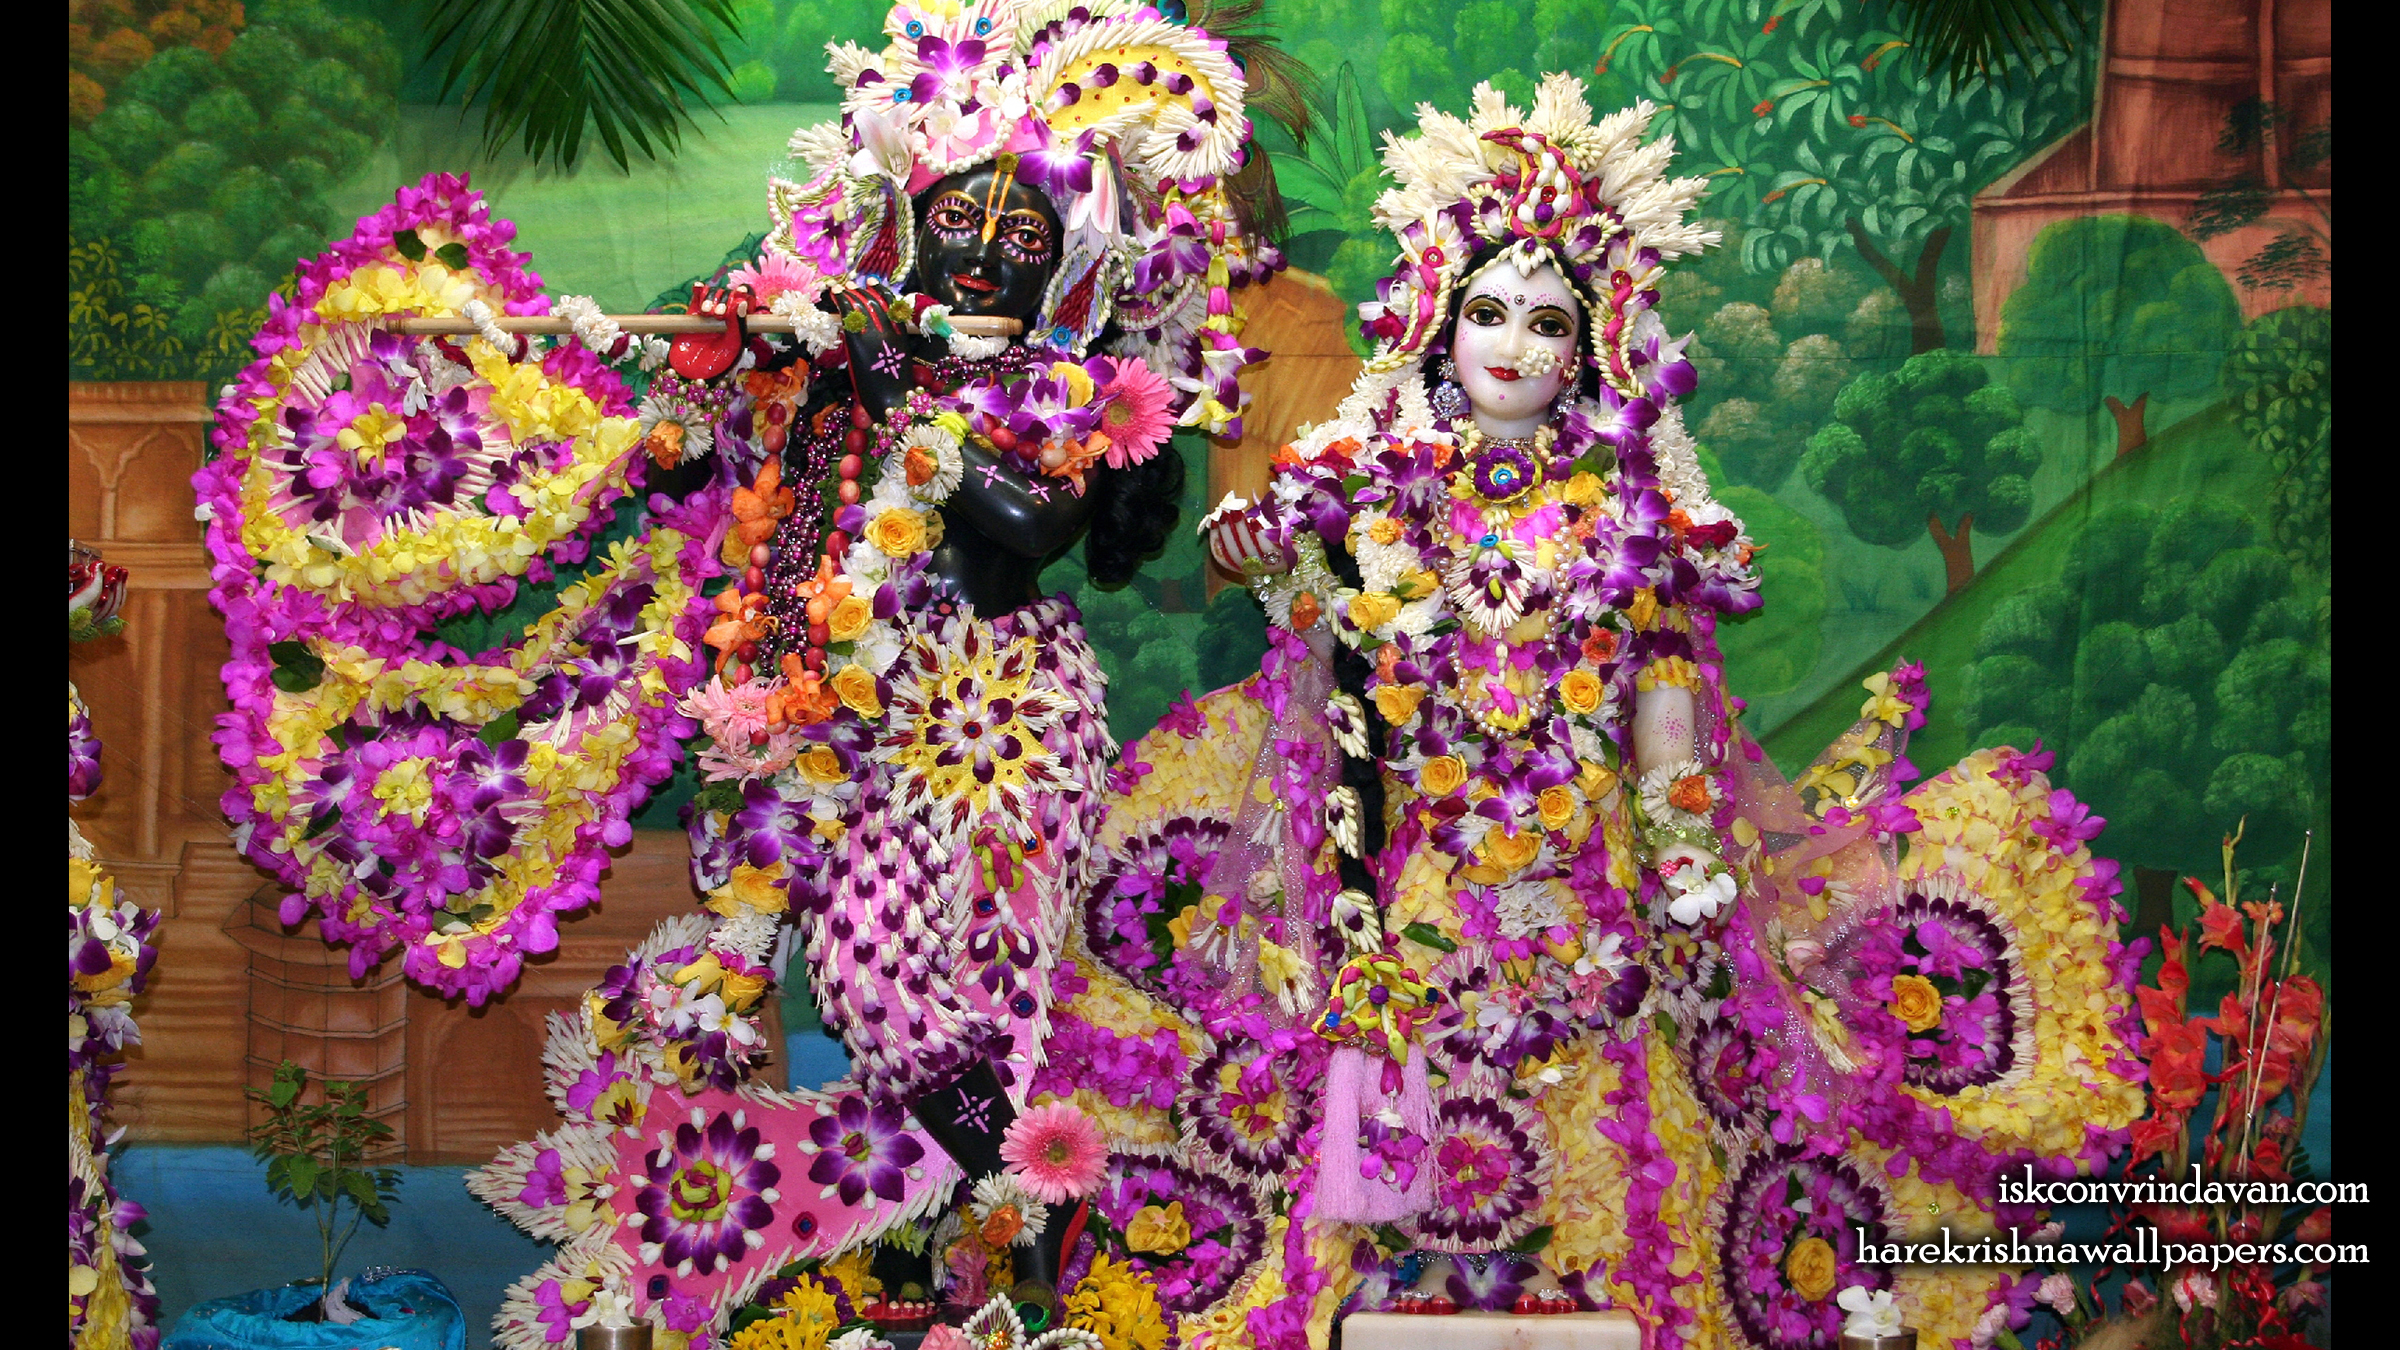 Sri Sri Radha Shyamsundar Wallpaper (010) Size 2400x1350 Download